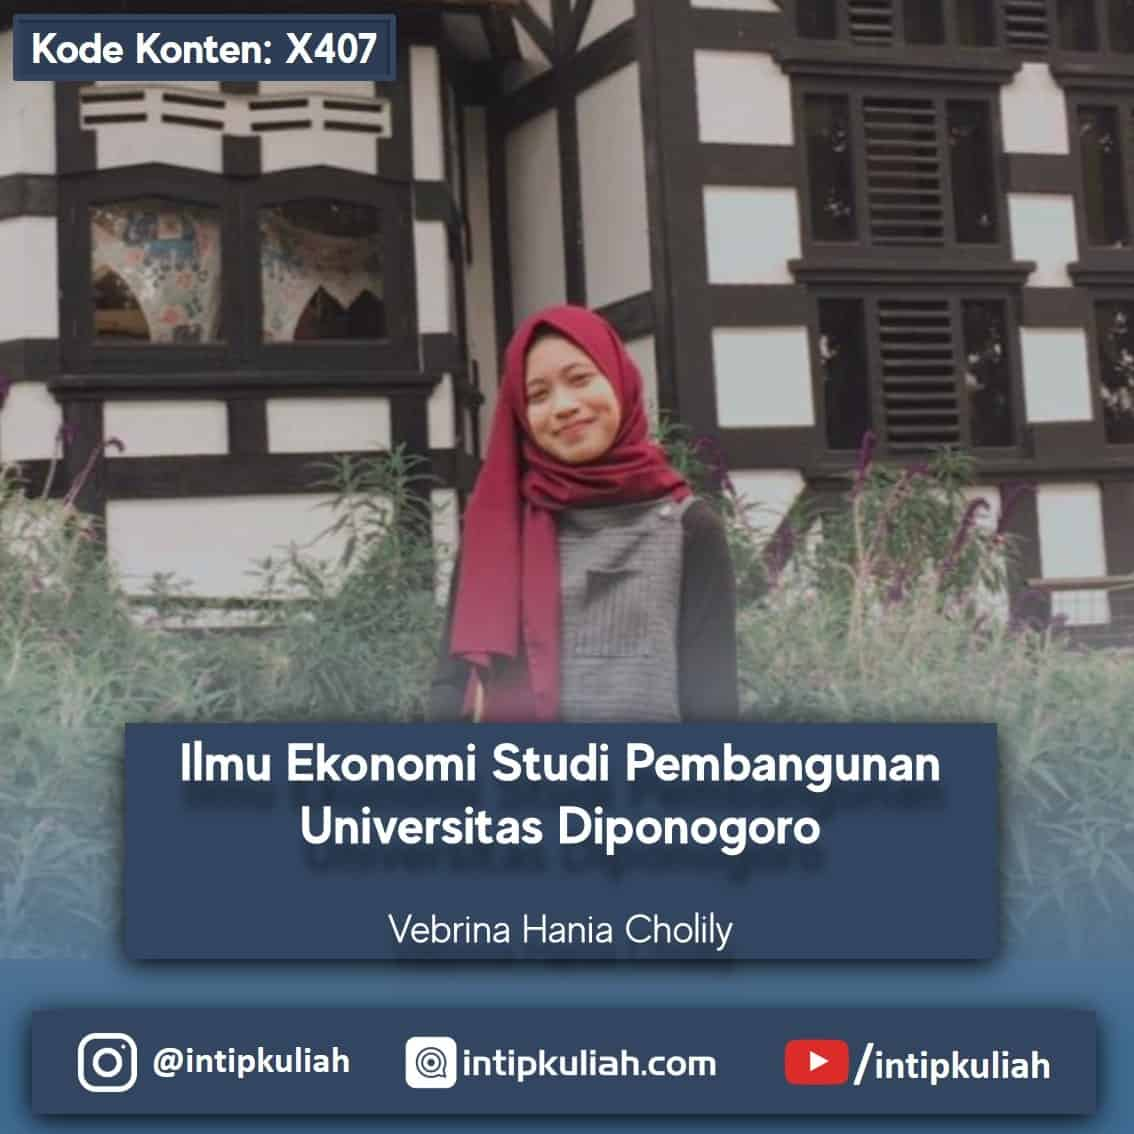 Ilmu Ekonomi Studi Pembangunan UNDIP (Vebrina)